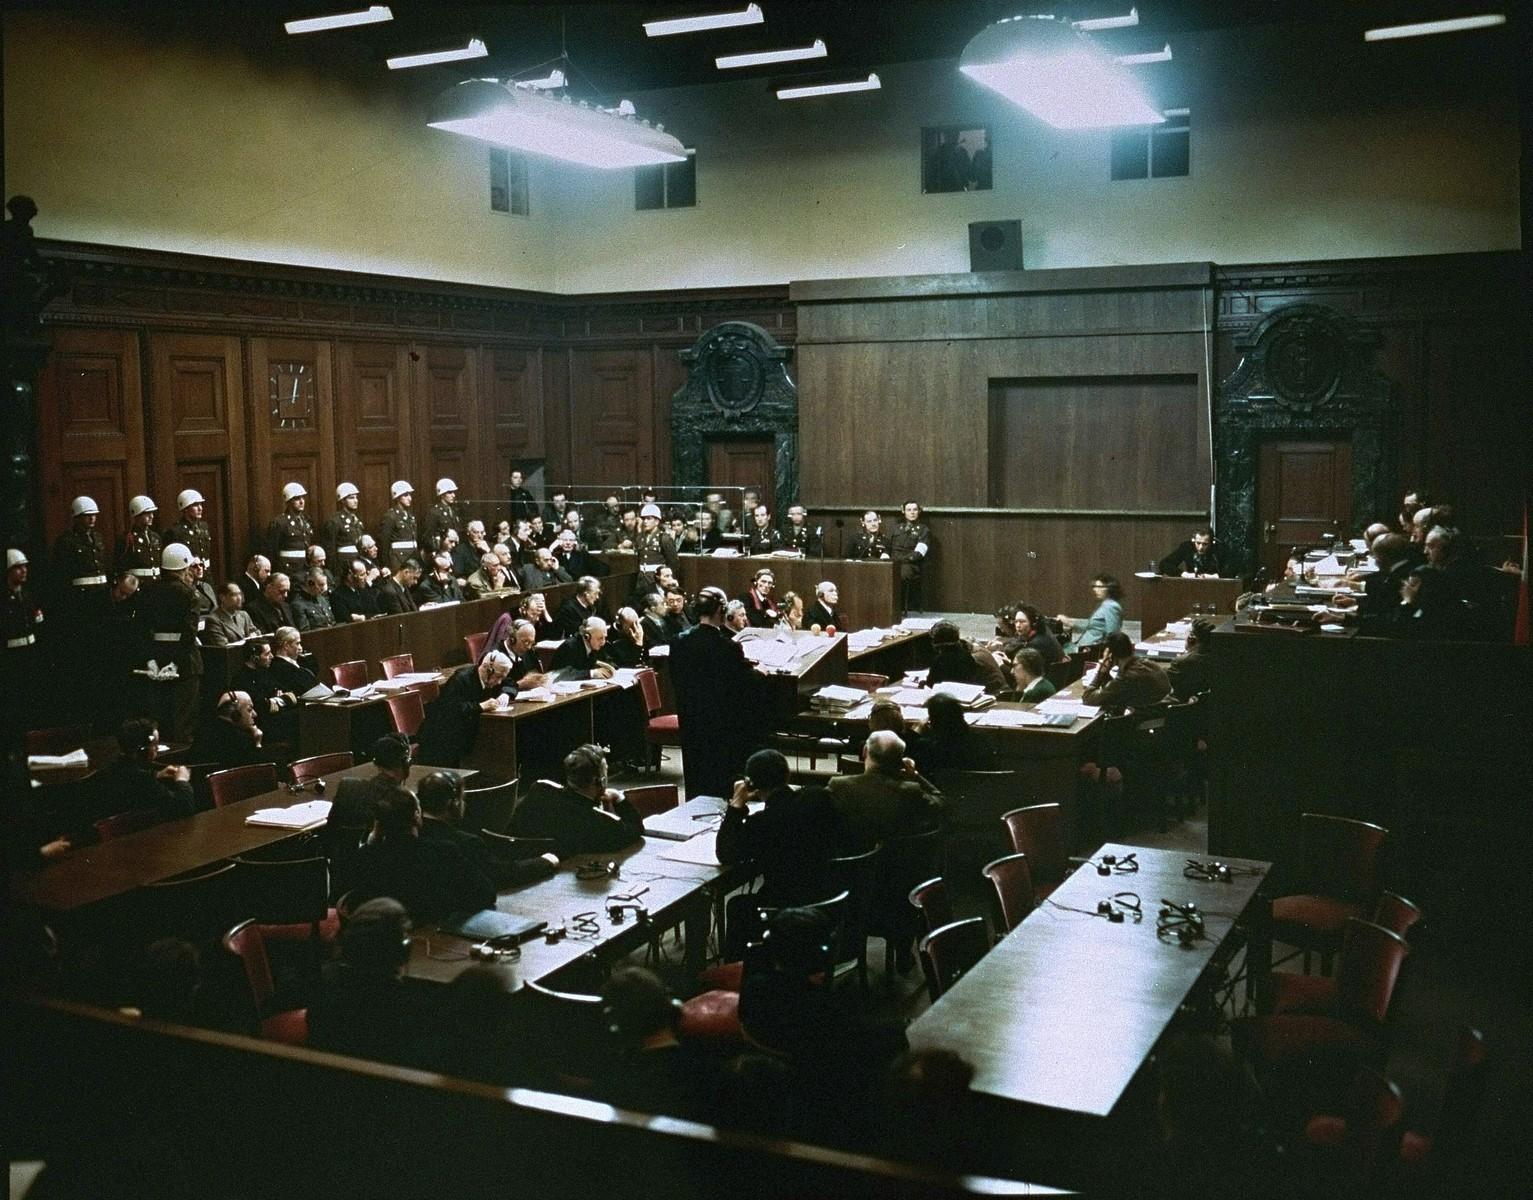 The International Military Tribunal trial of war criminals at Nuremberg.